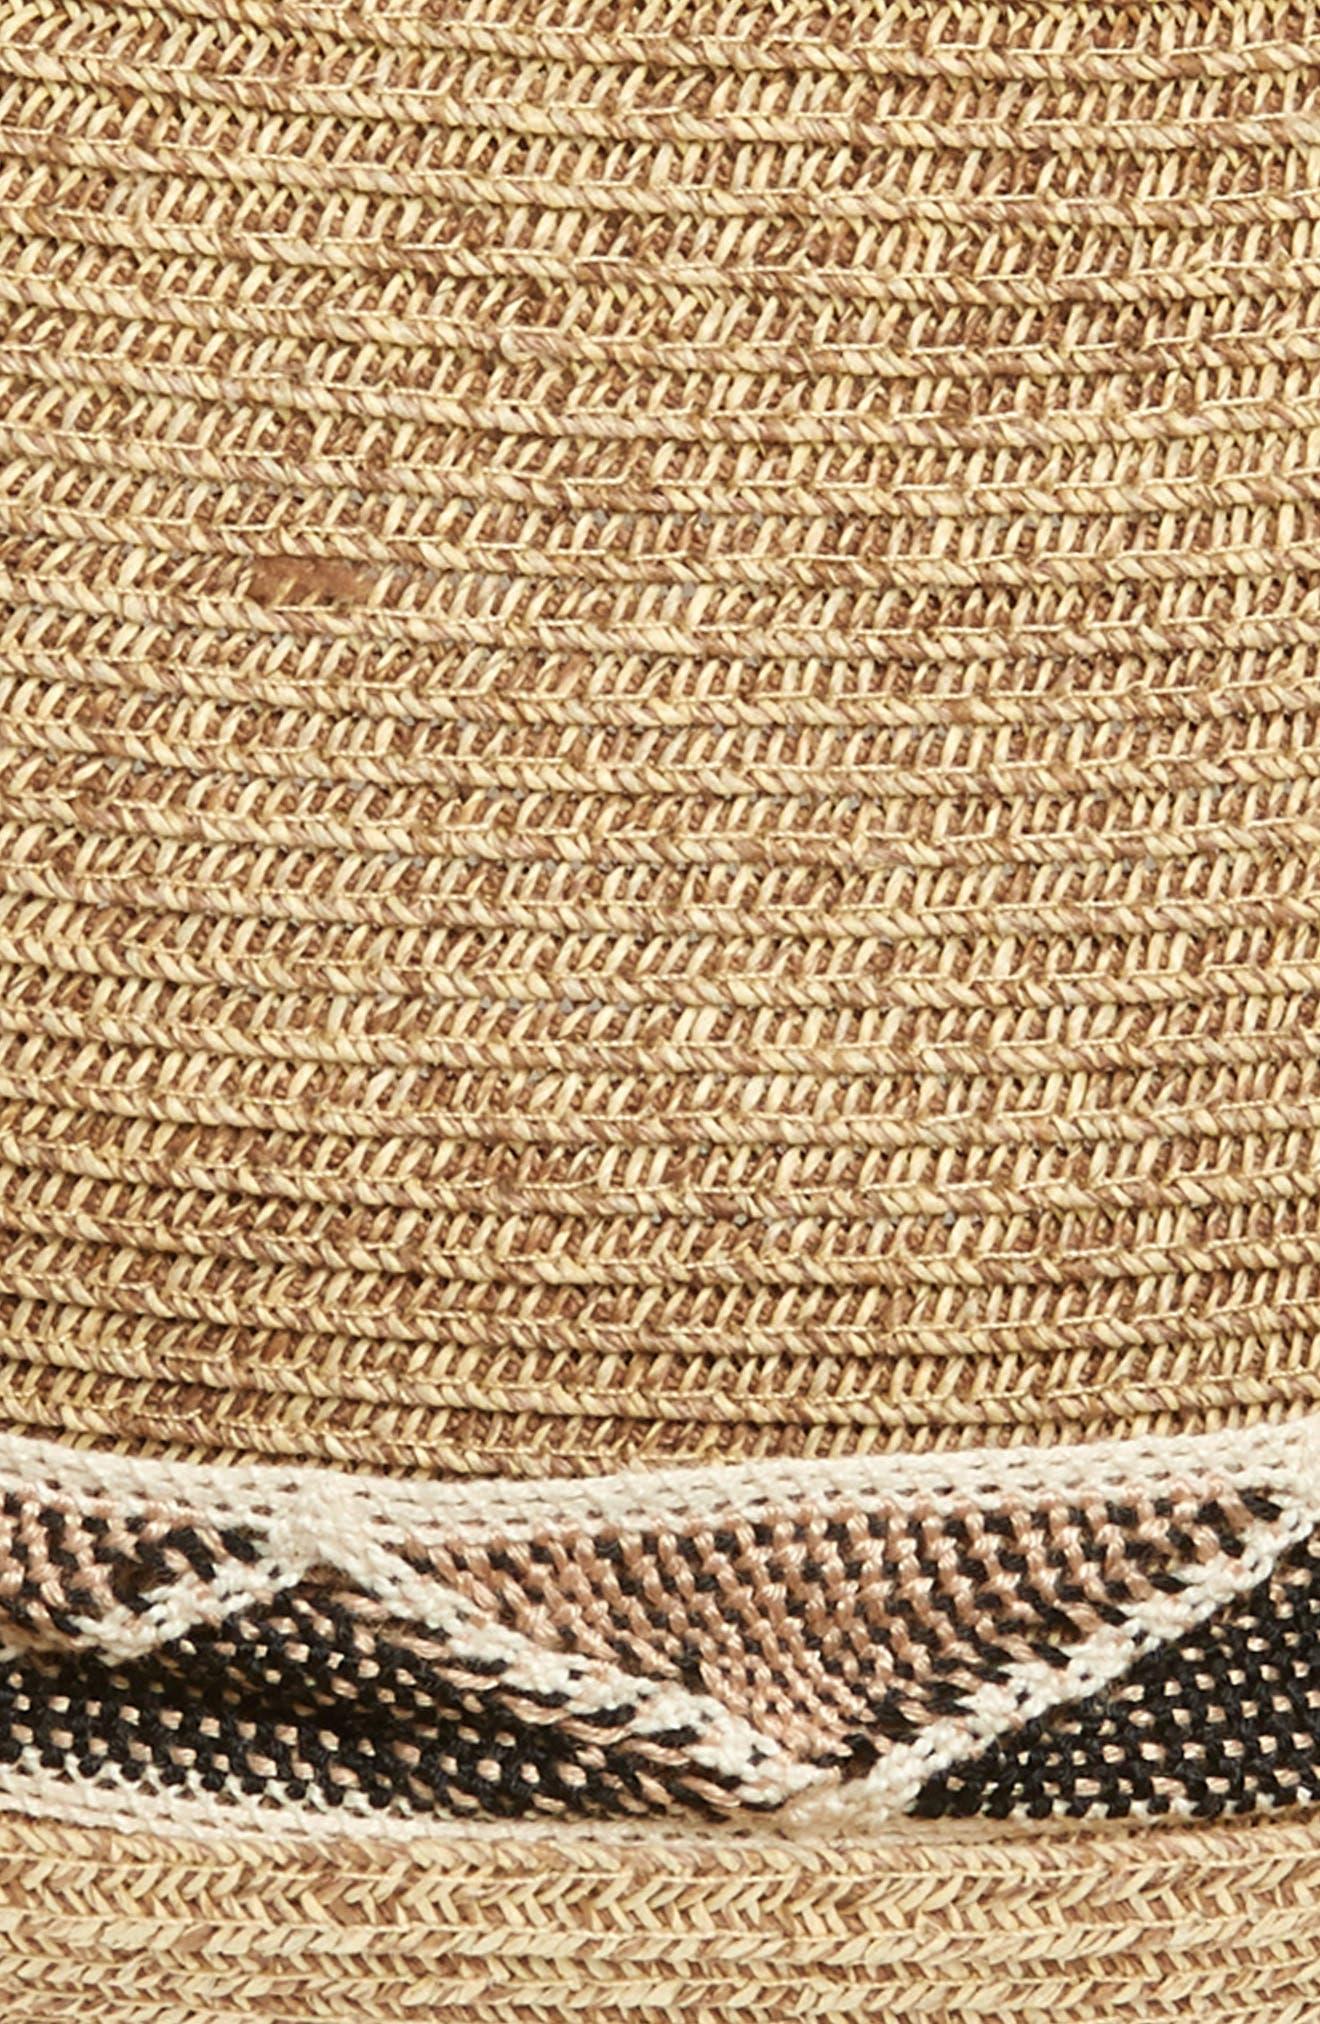 Albuquerque Straw Hat,                             Alternate thumbnail 2, color,                             Brown